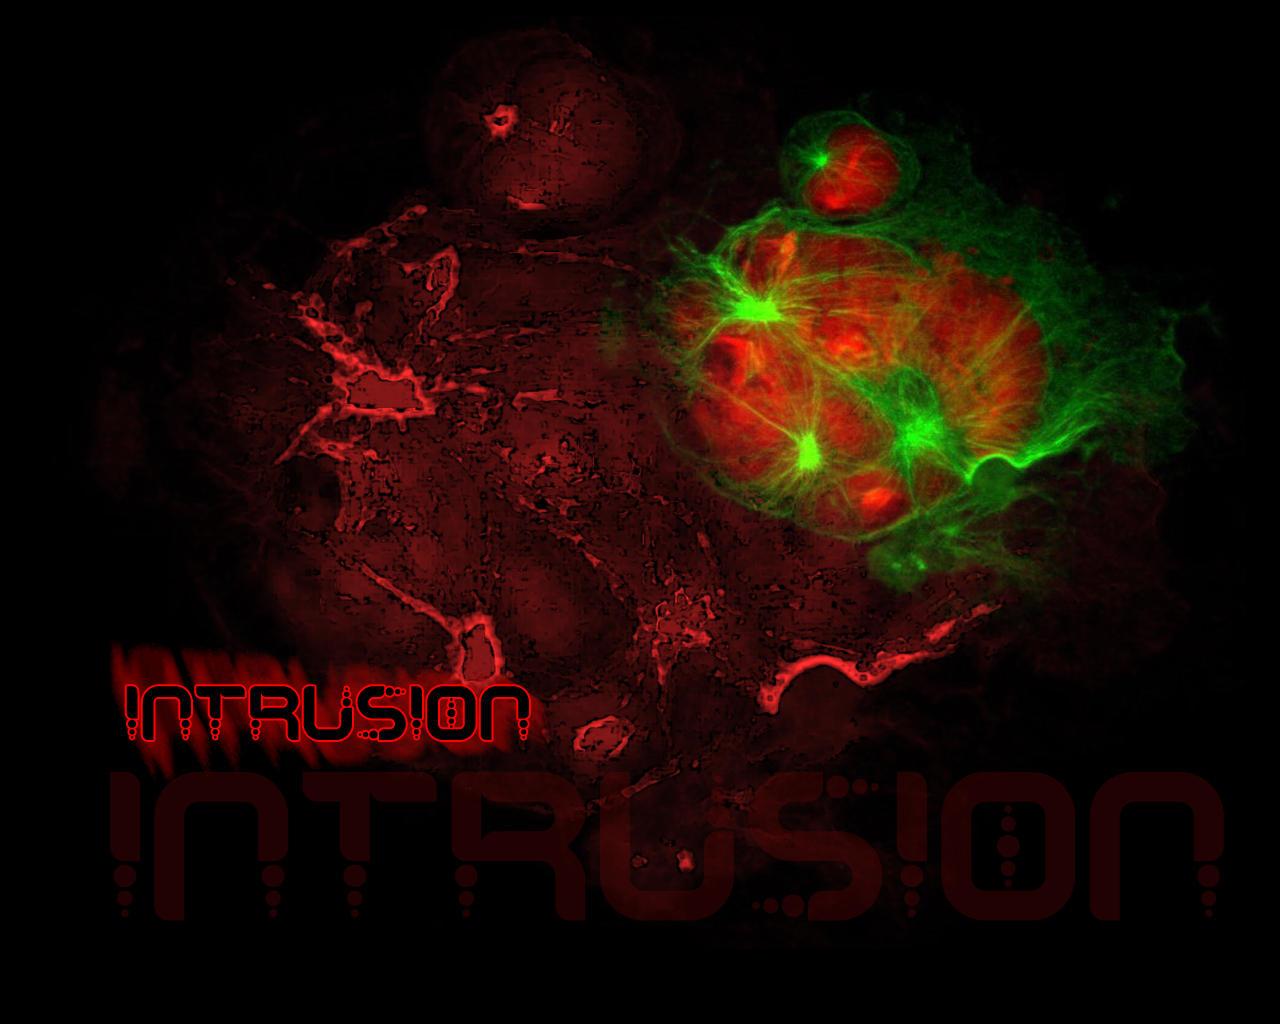 Intrusion Version 2 by mr-whyte